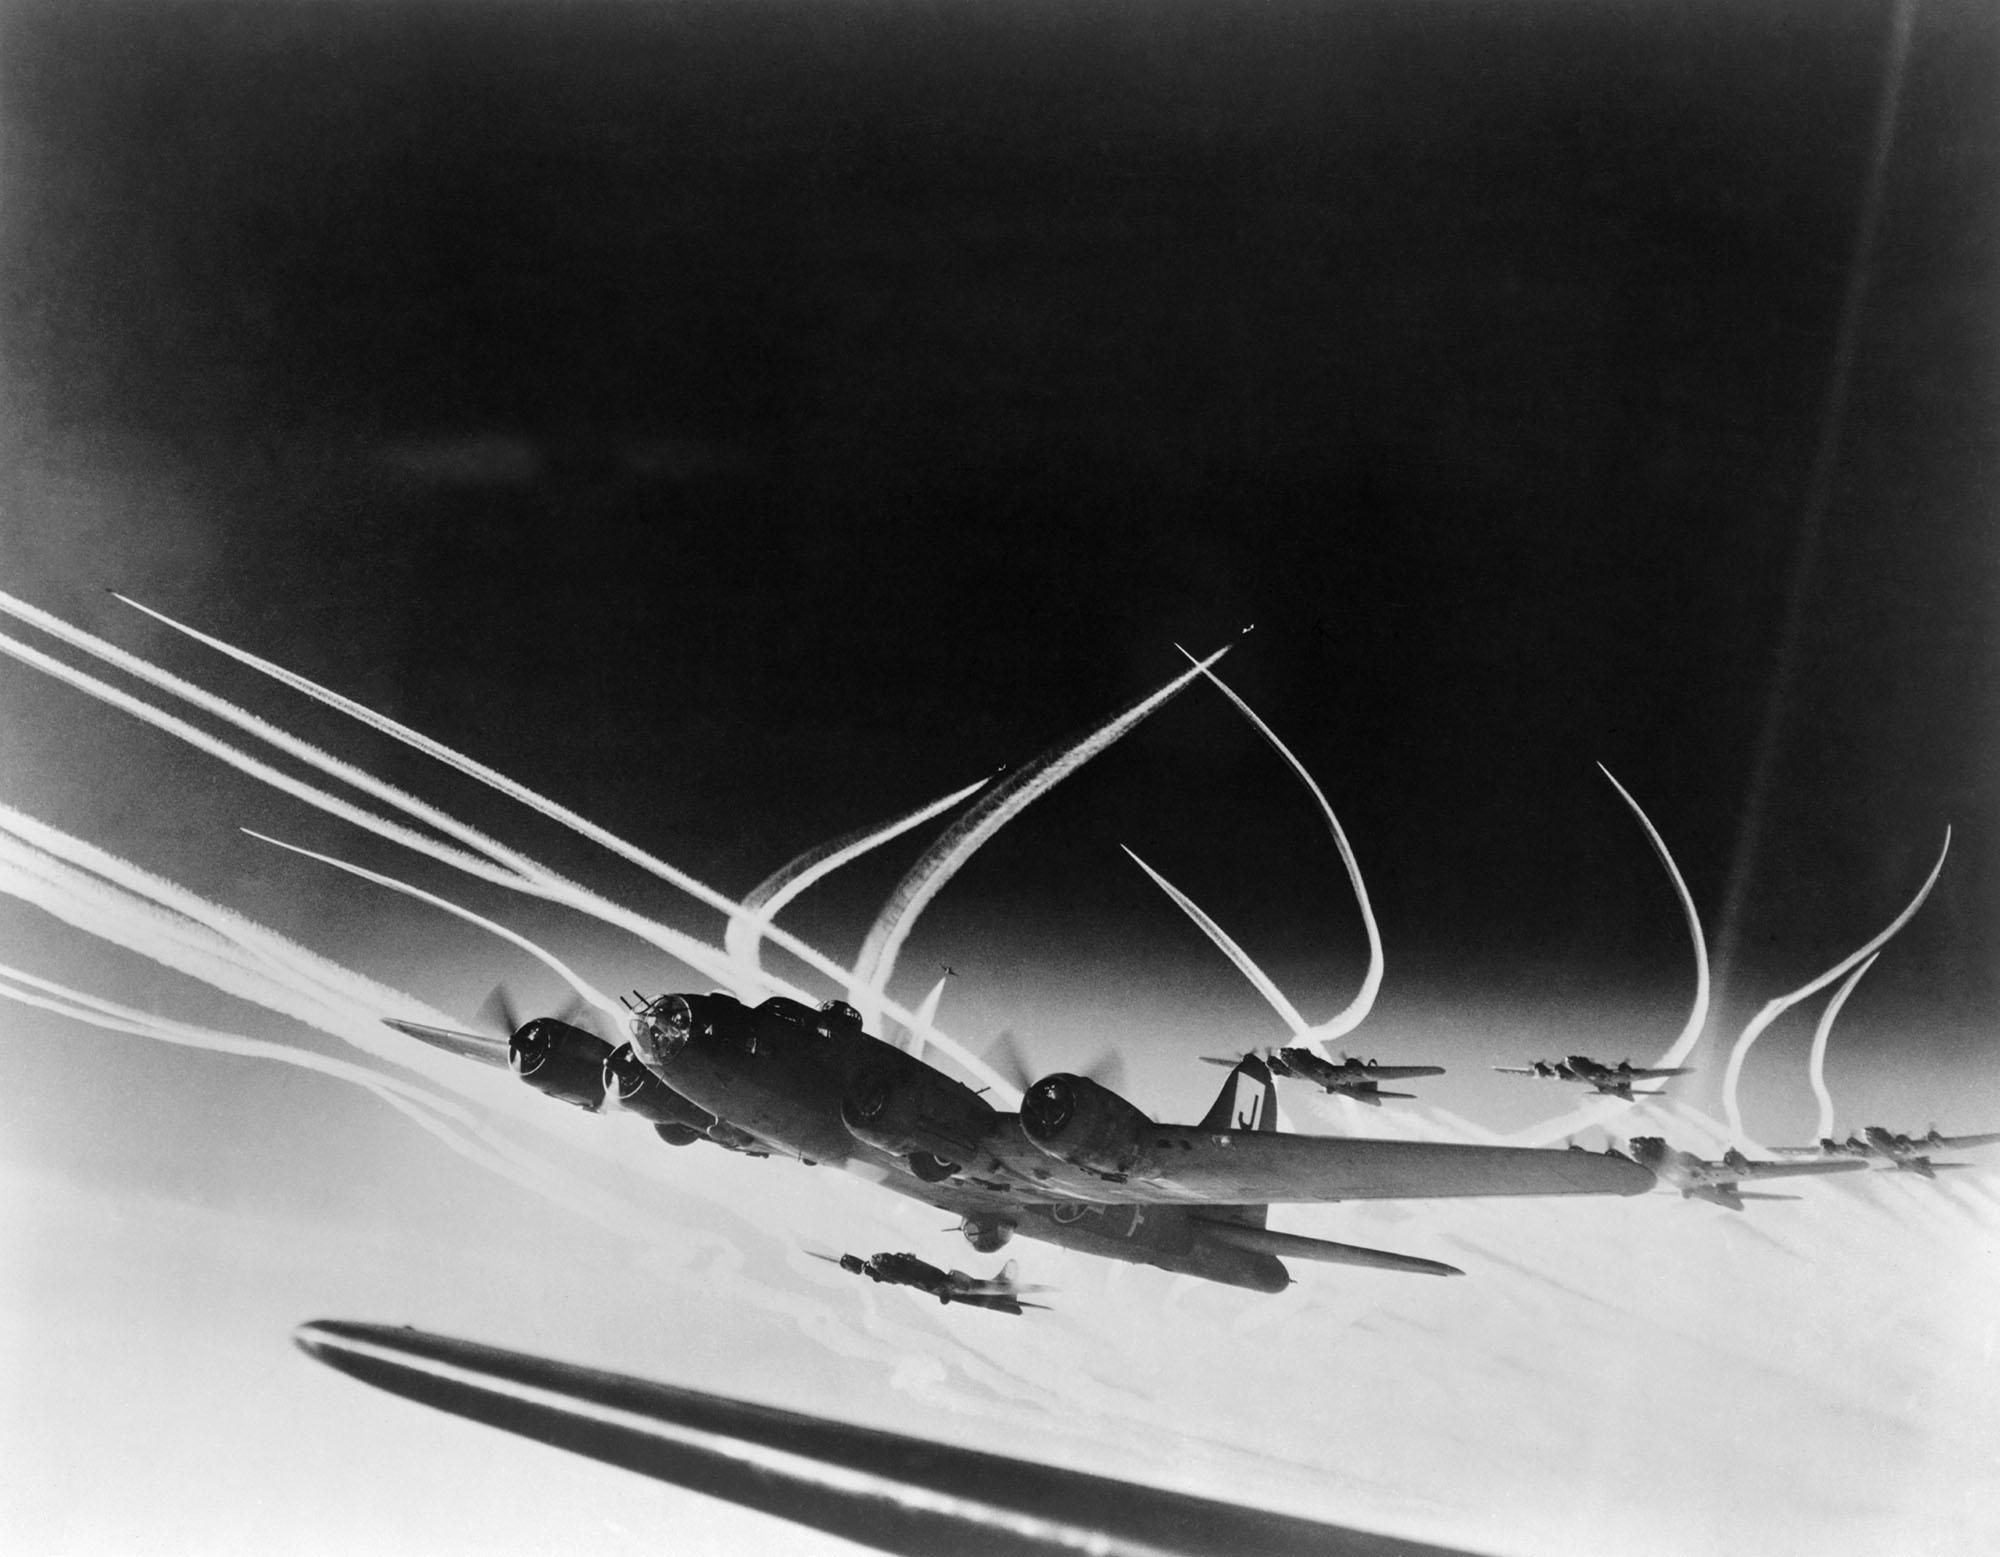 Going Direct: B-17 Crash Ignites Warbird Controversy